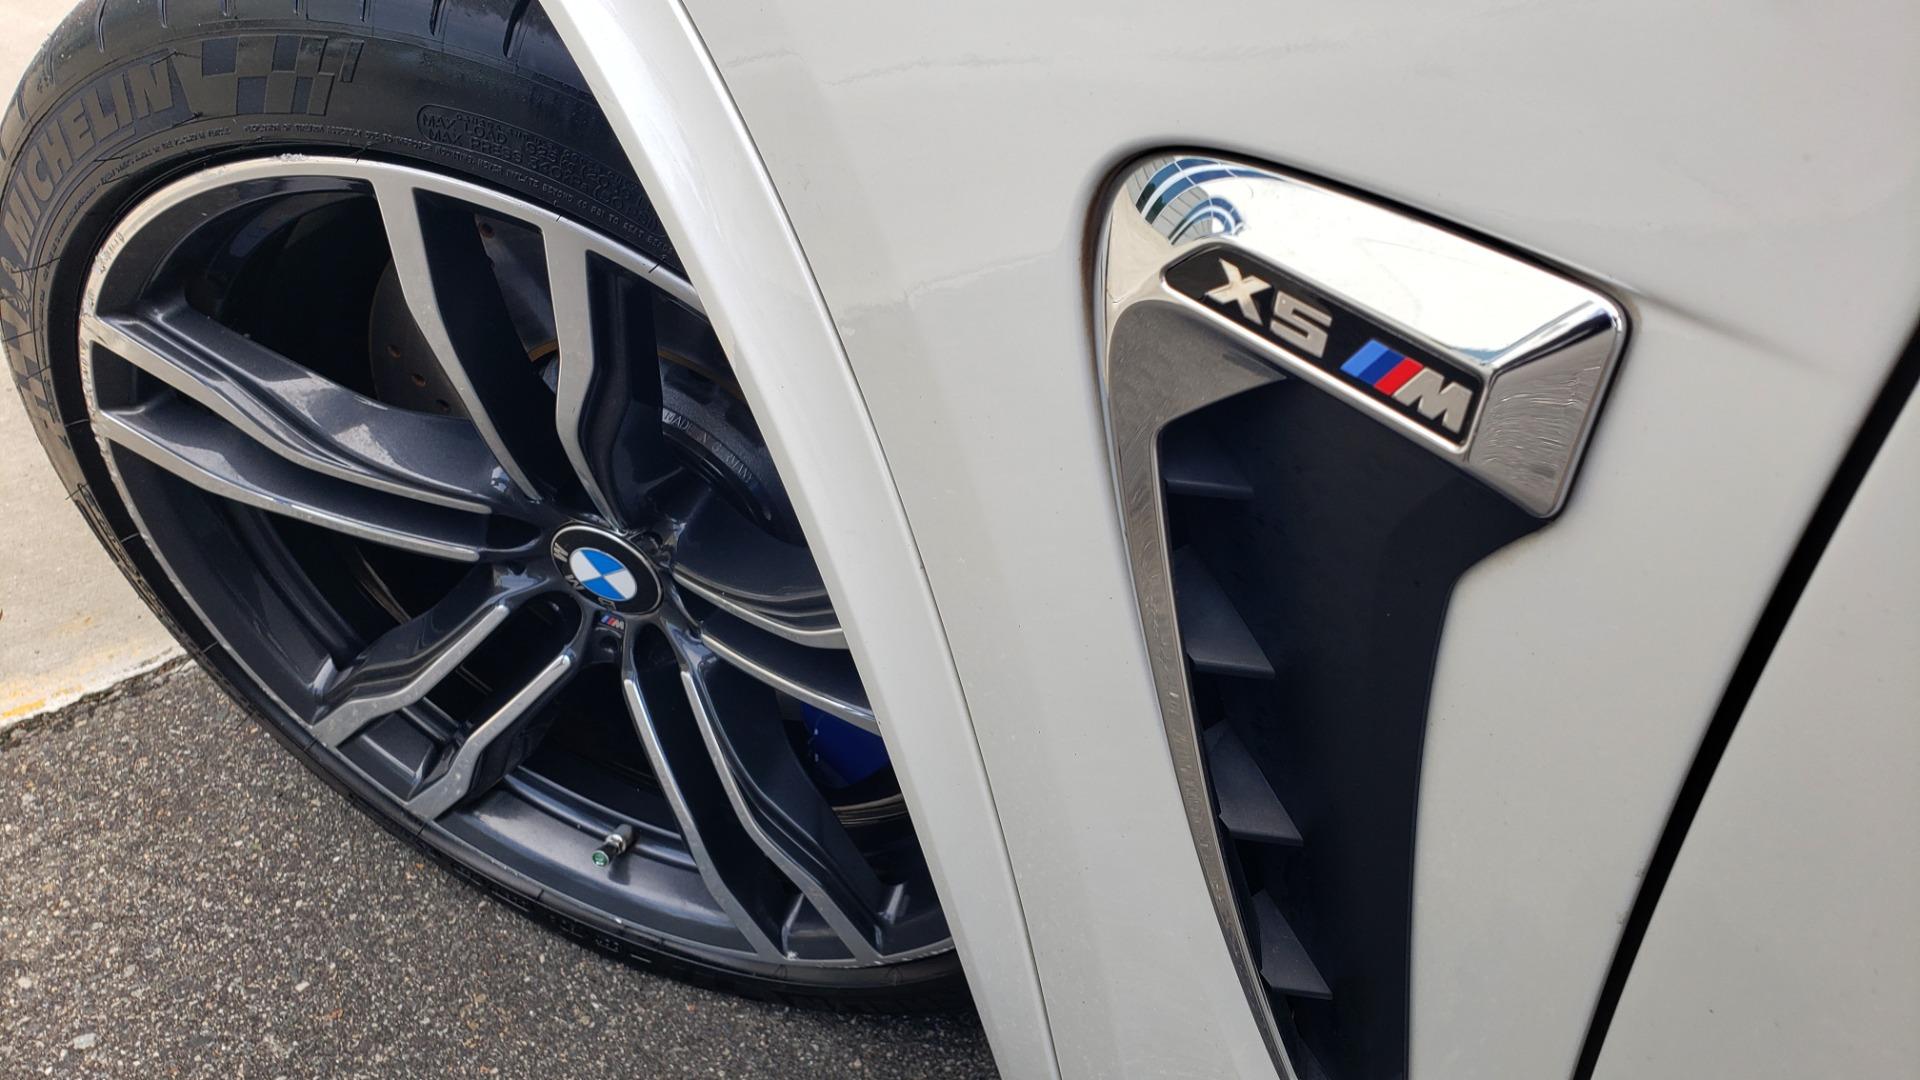 Used 2017 BMW X5 M EXECUTIVE PKG / NAV / DRVR ASST / BSM / HUD / HTD STS / WIFI for sale Sold at Formula Imports in Charlotte NC 28227 84